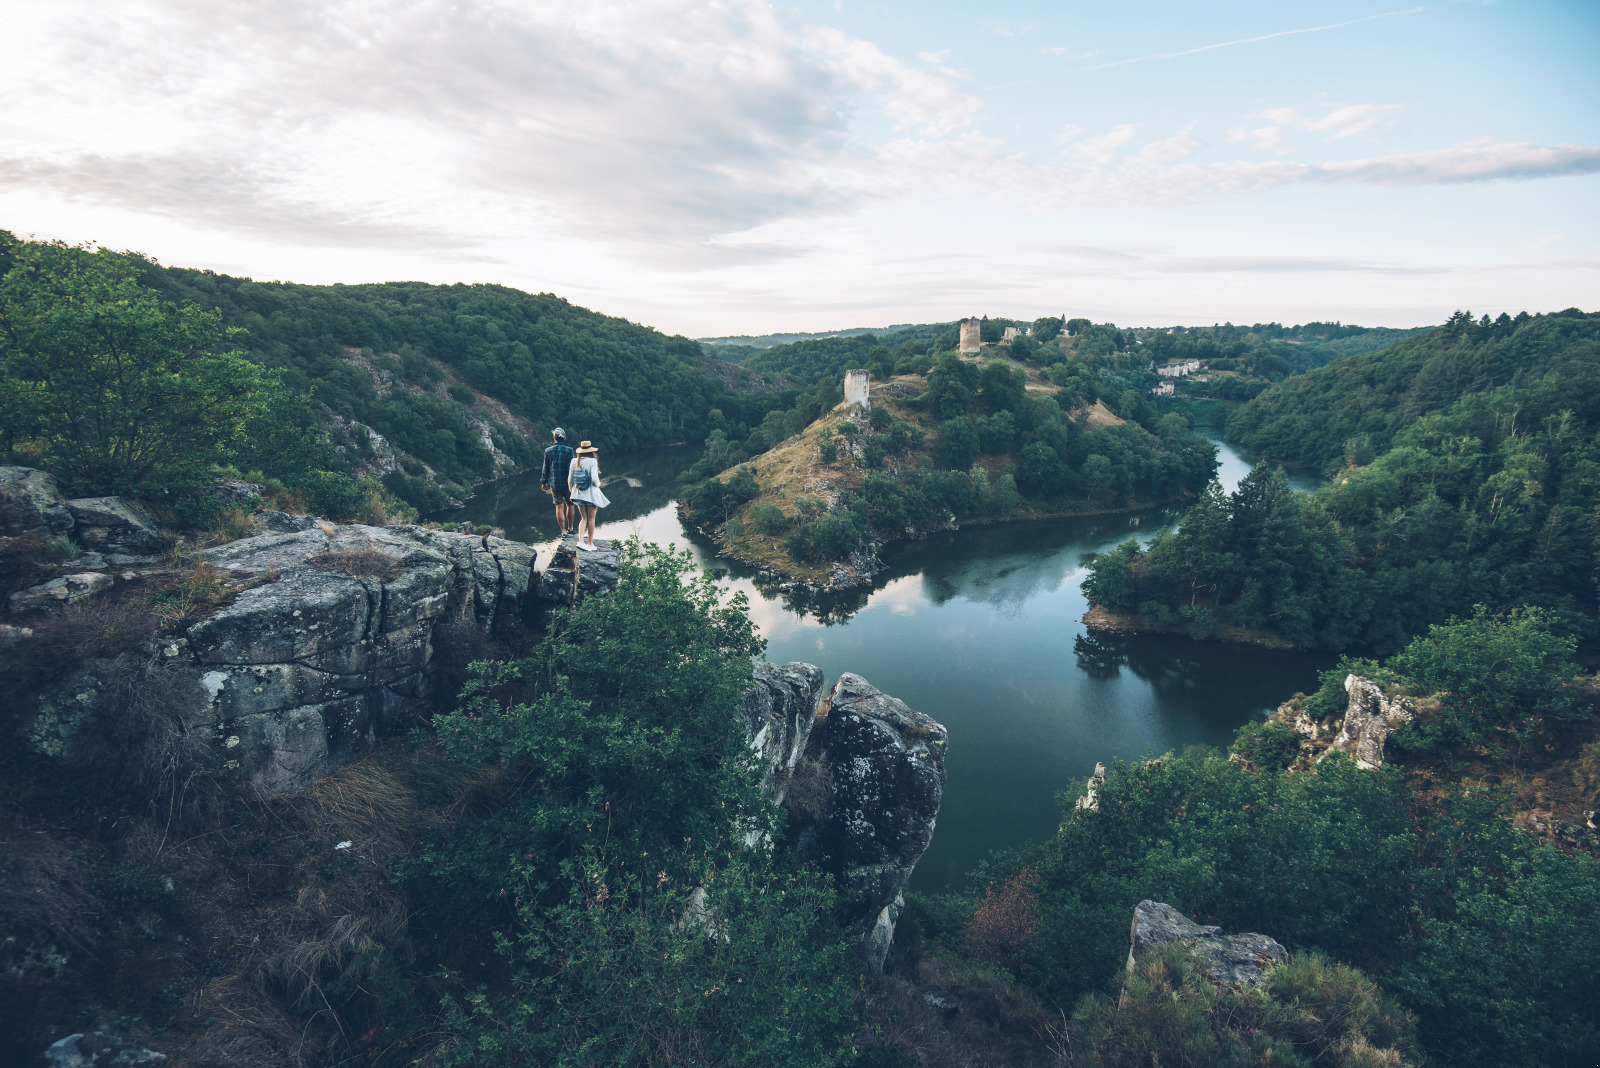 Vue sur les ruines de Crozant depuis le rocher de la Fileuse © Bestjobers - Max Coquard